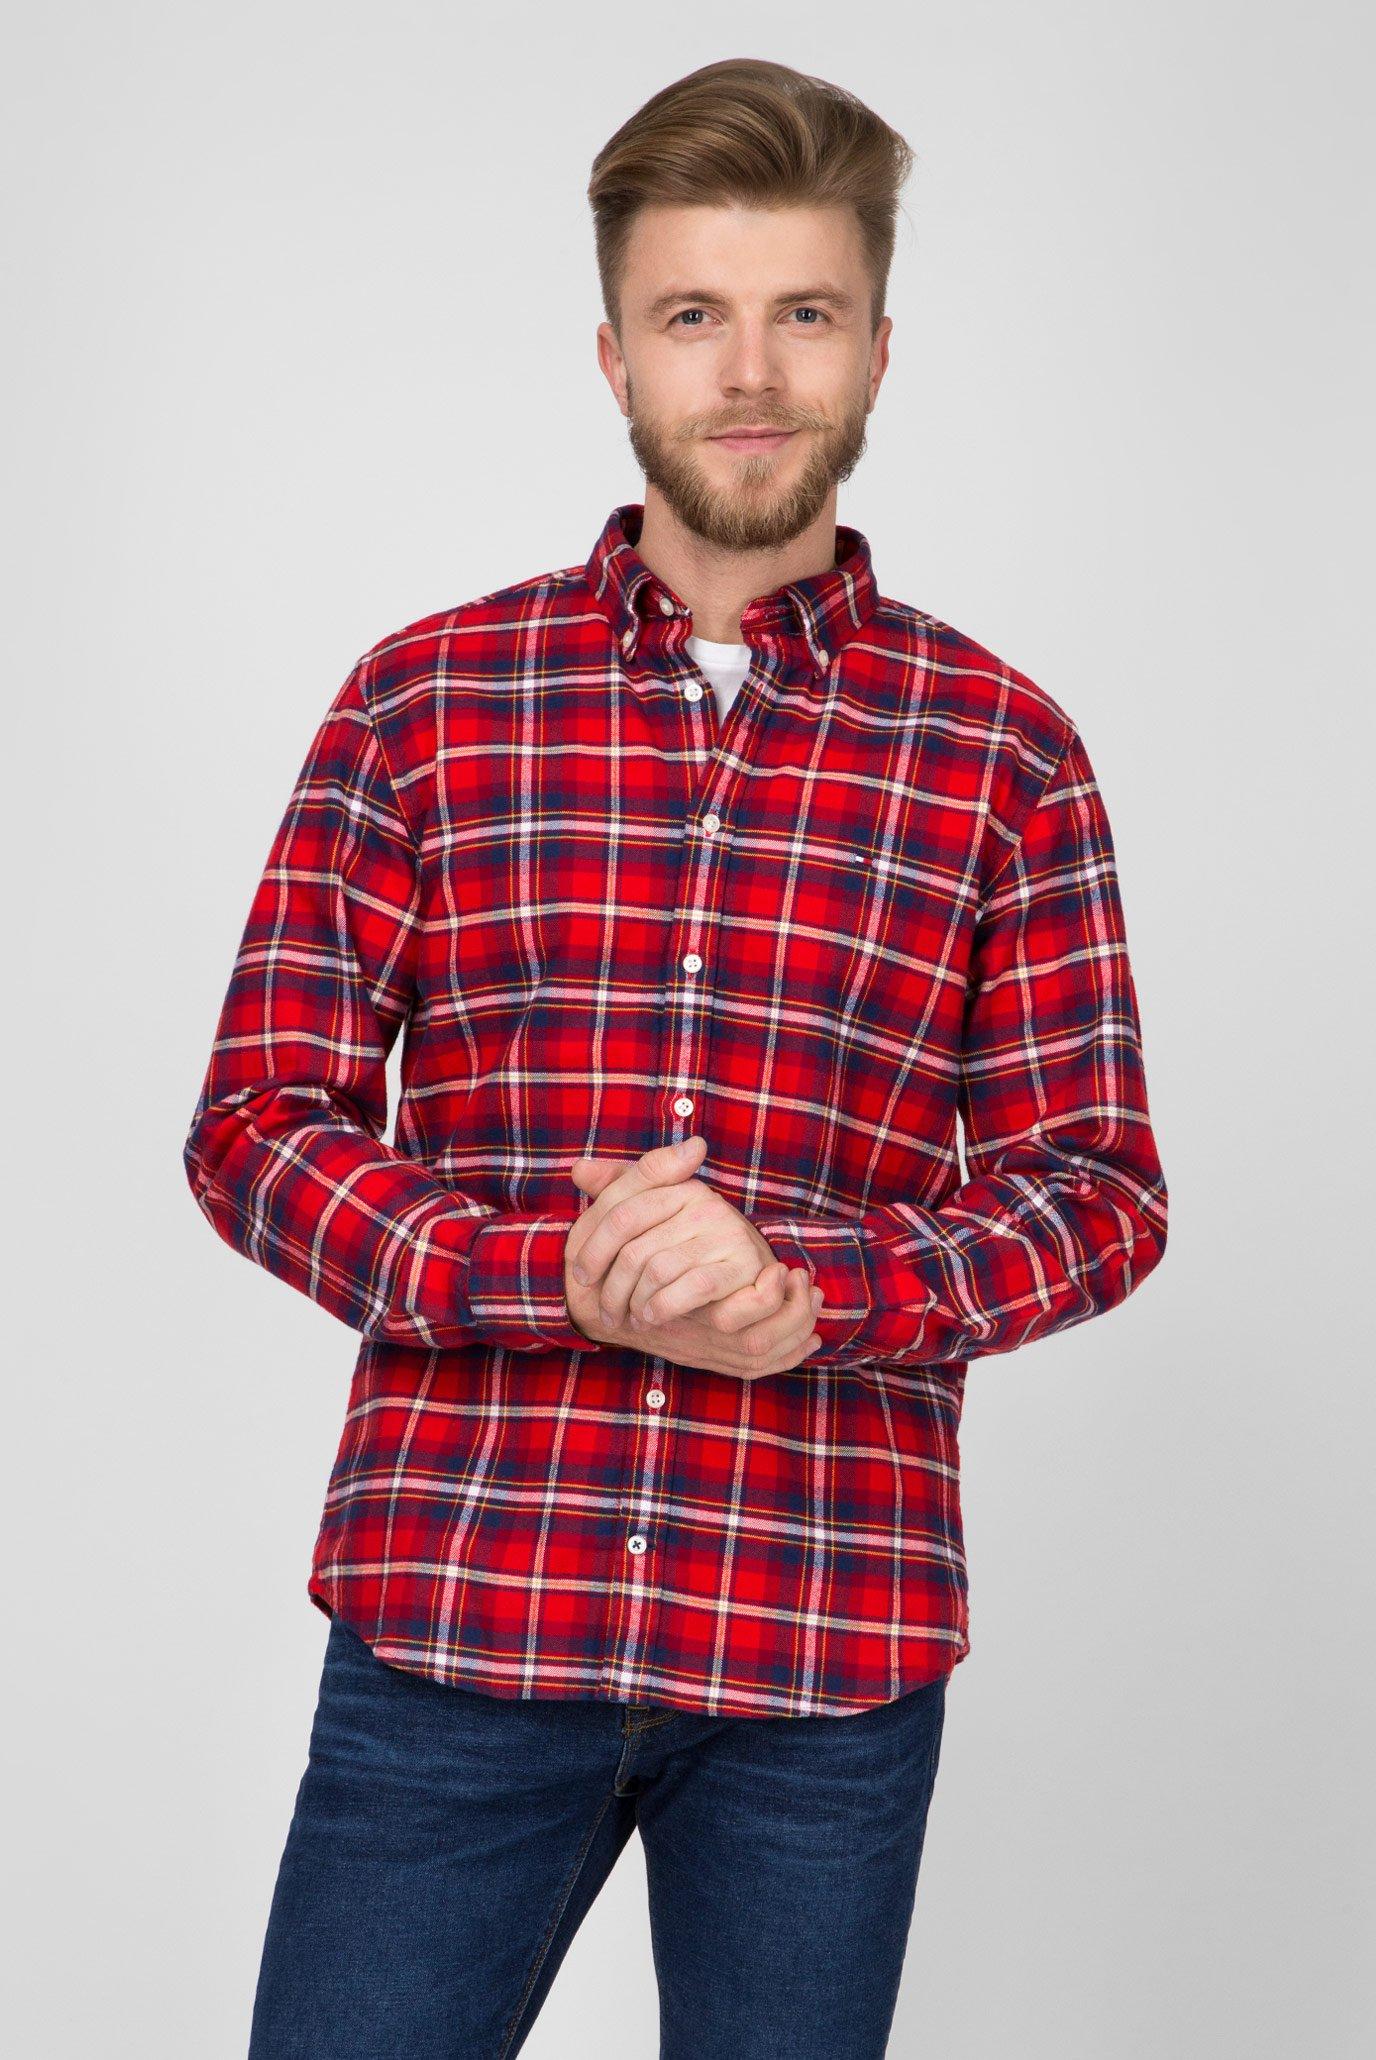 7a7b593941e Купить Мужская красная рубашка в клетку Tommy Hilfiger Tommy Hilfiger  MW0MW08177 – Киев